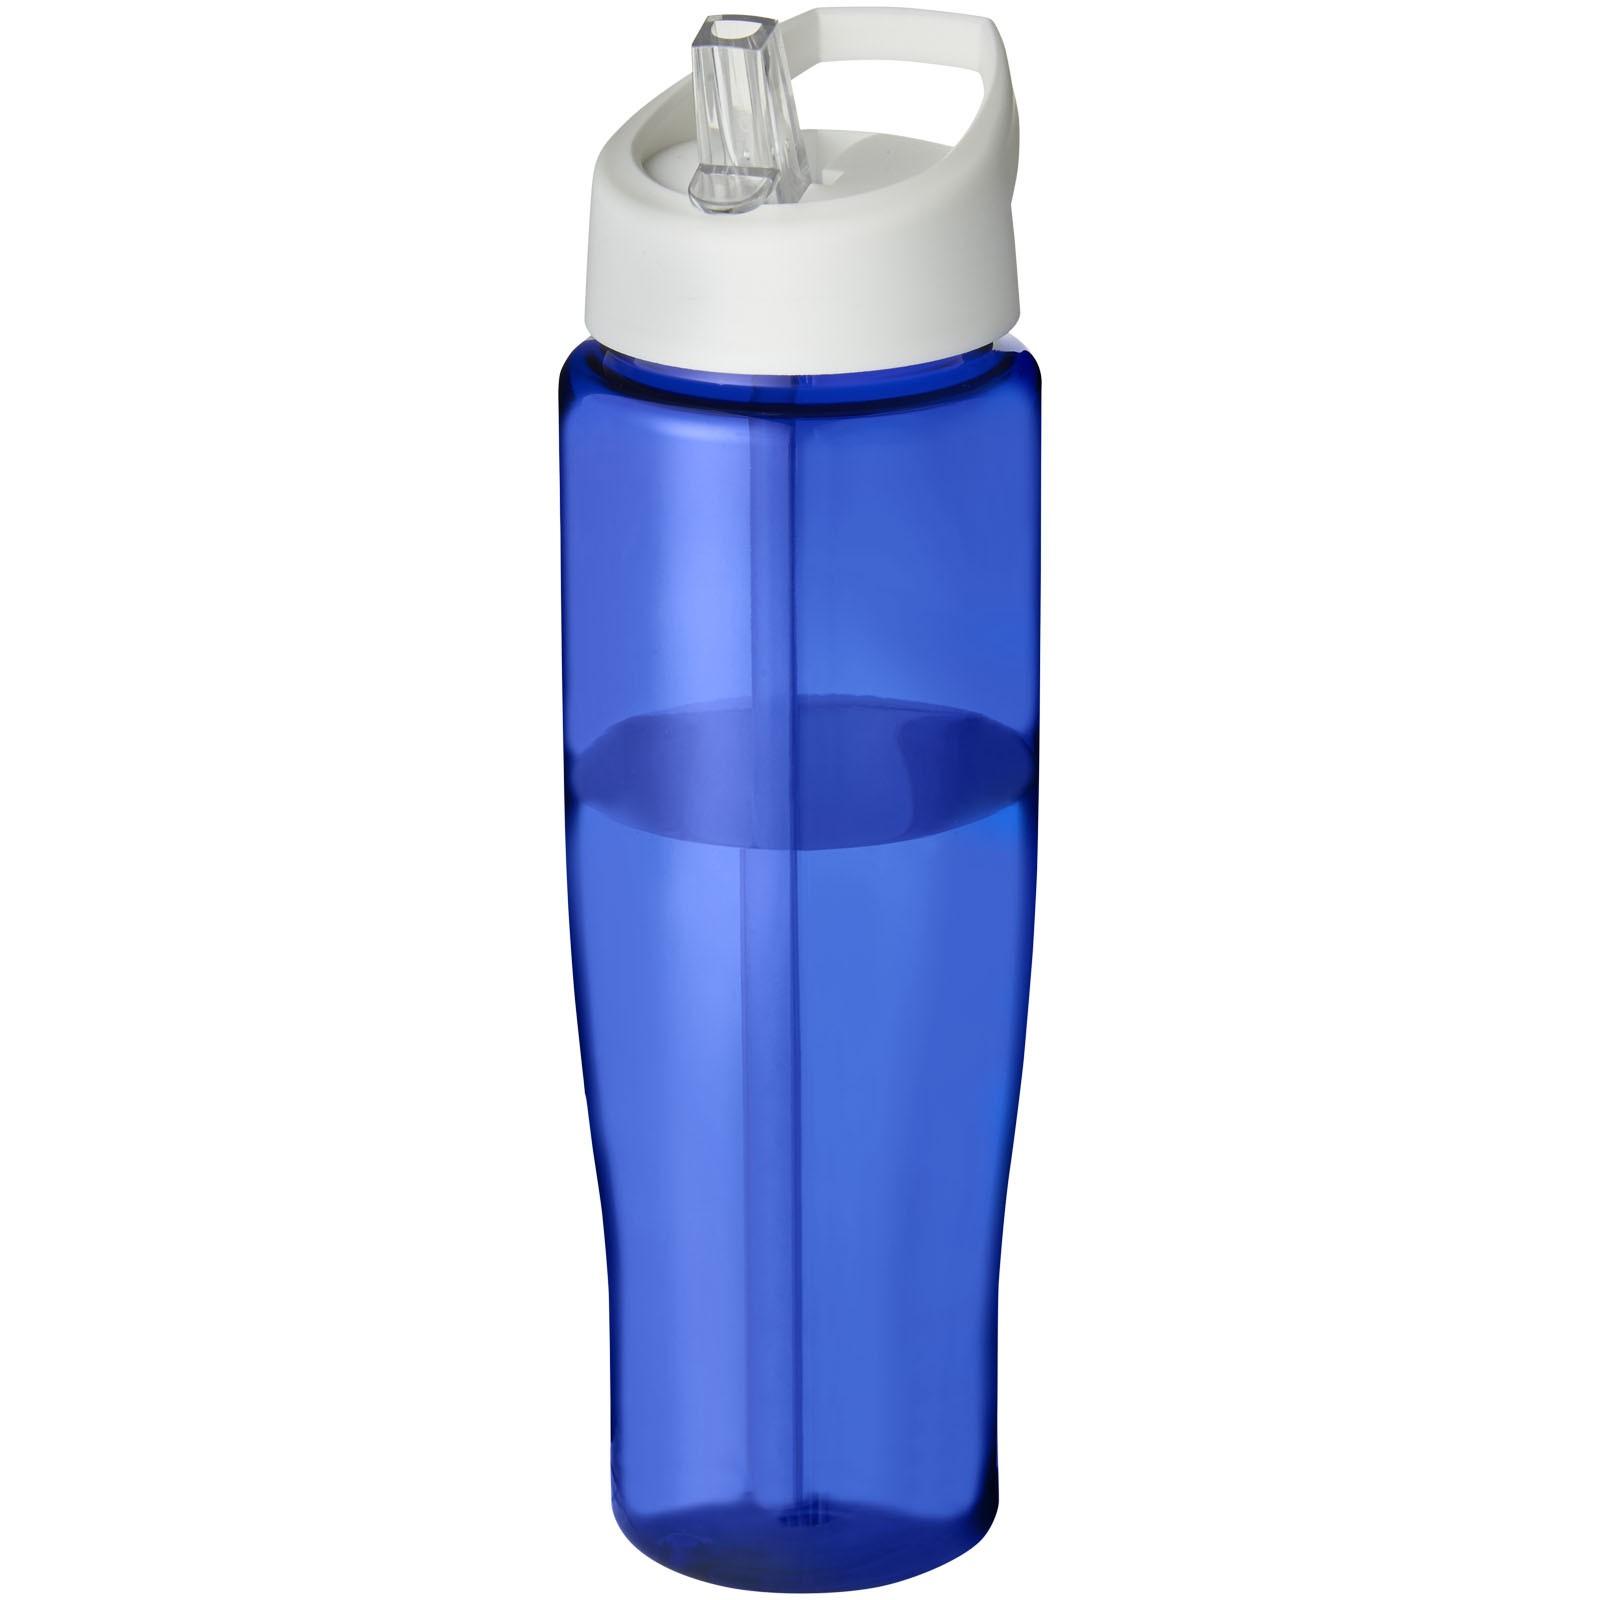 H2O Tempo® 700 ml spout lid sport bottle - Blue / White